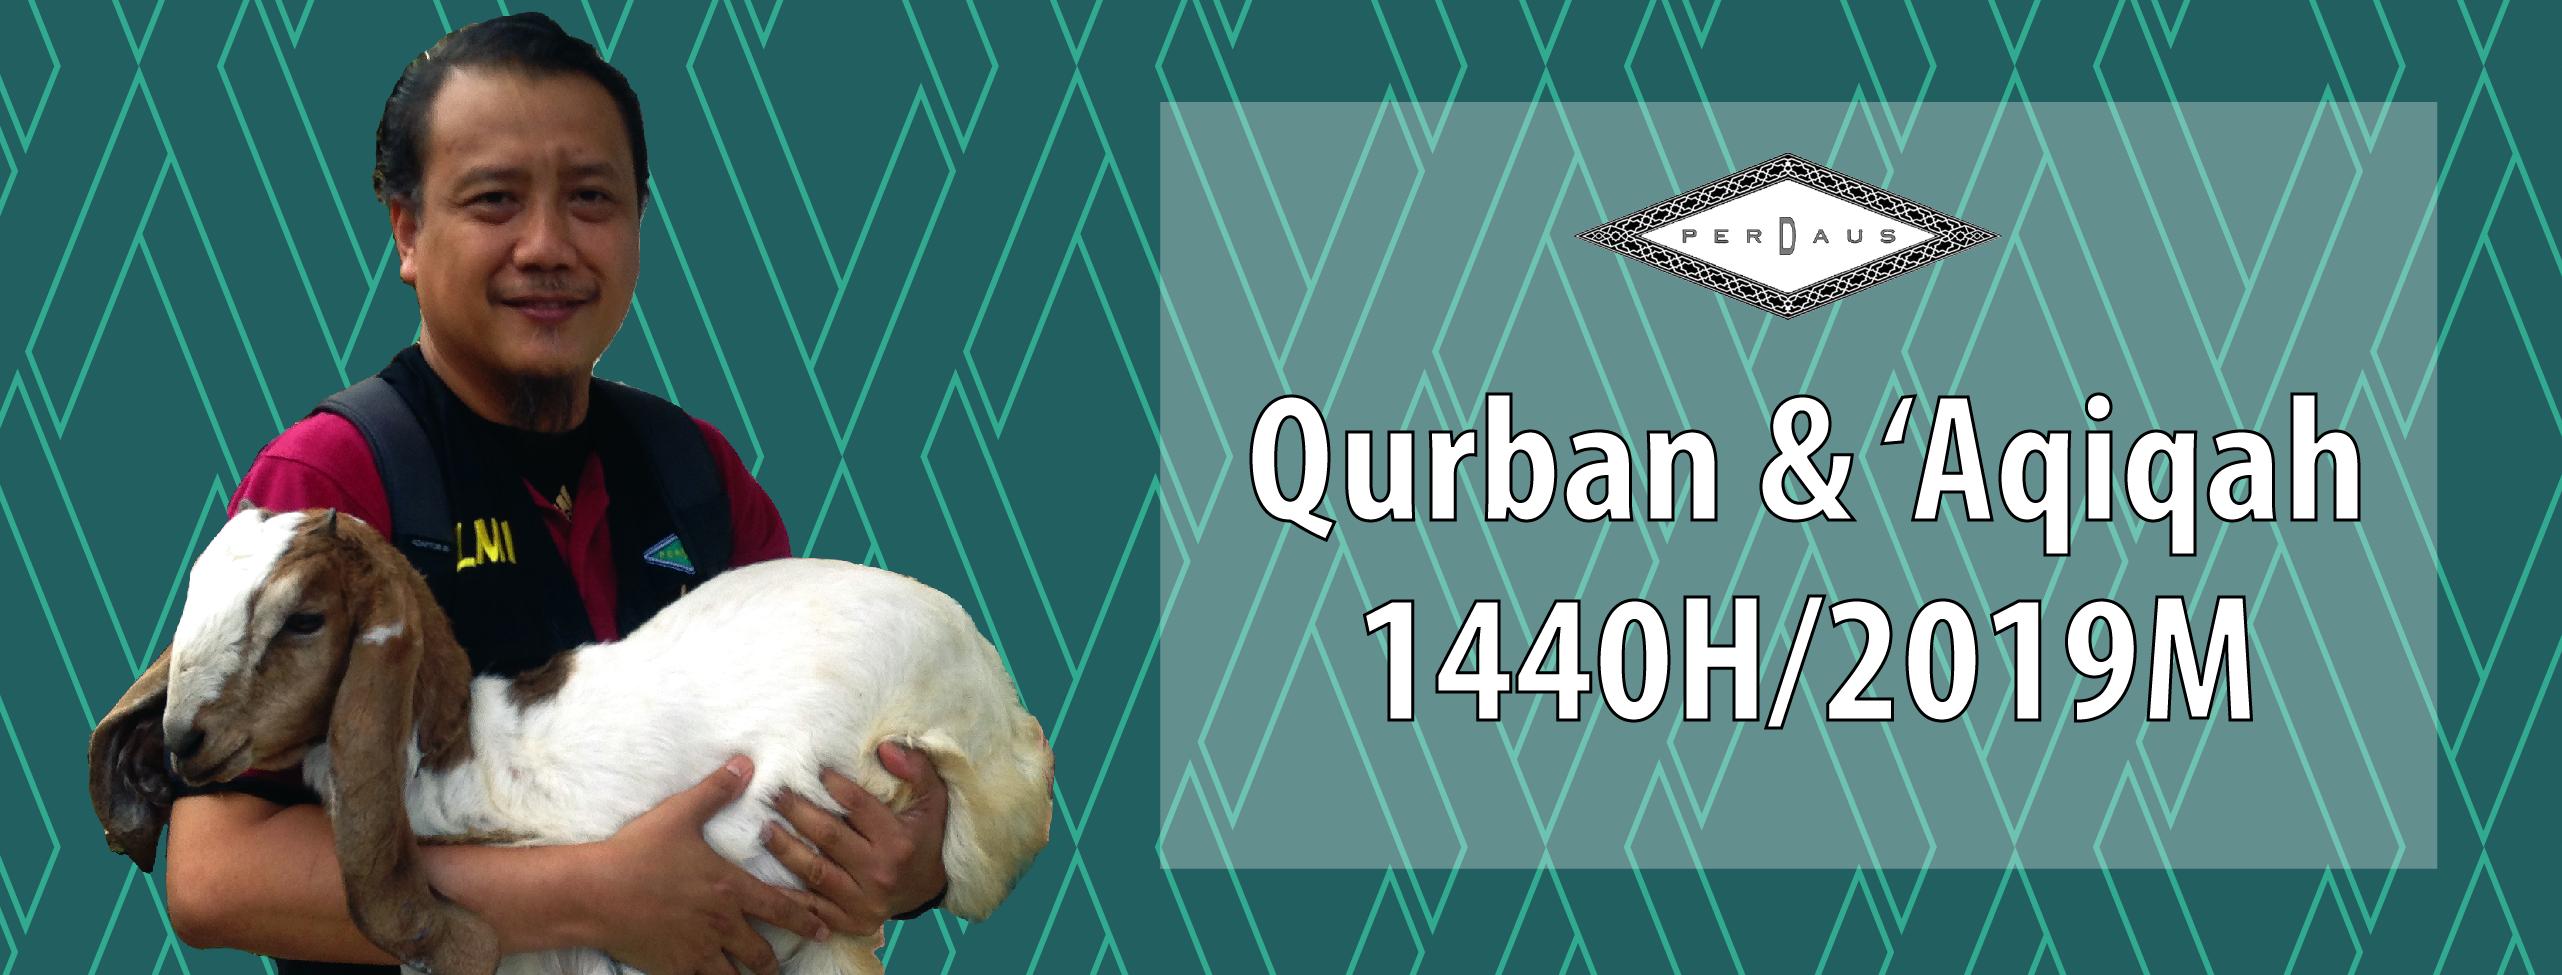 Qurban 2019 Banner-01